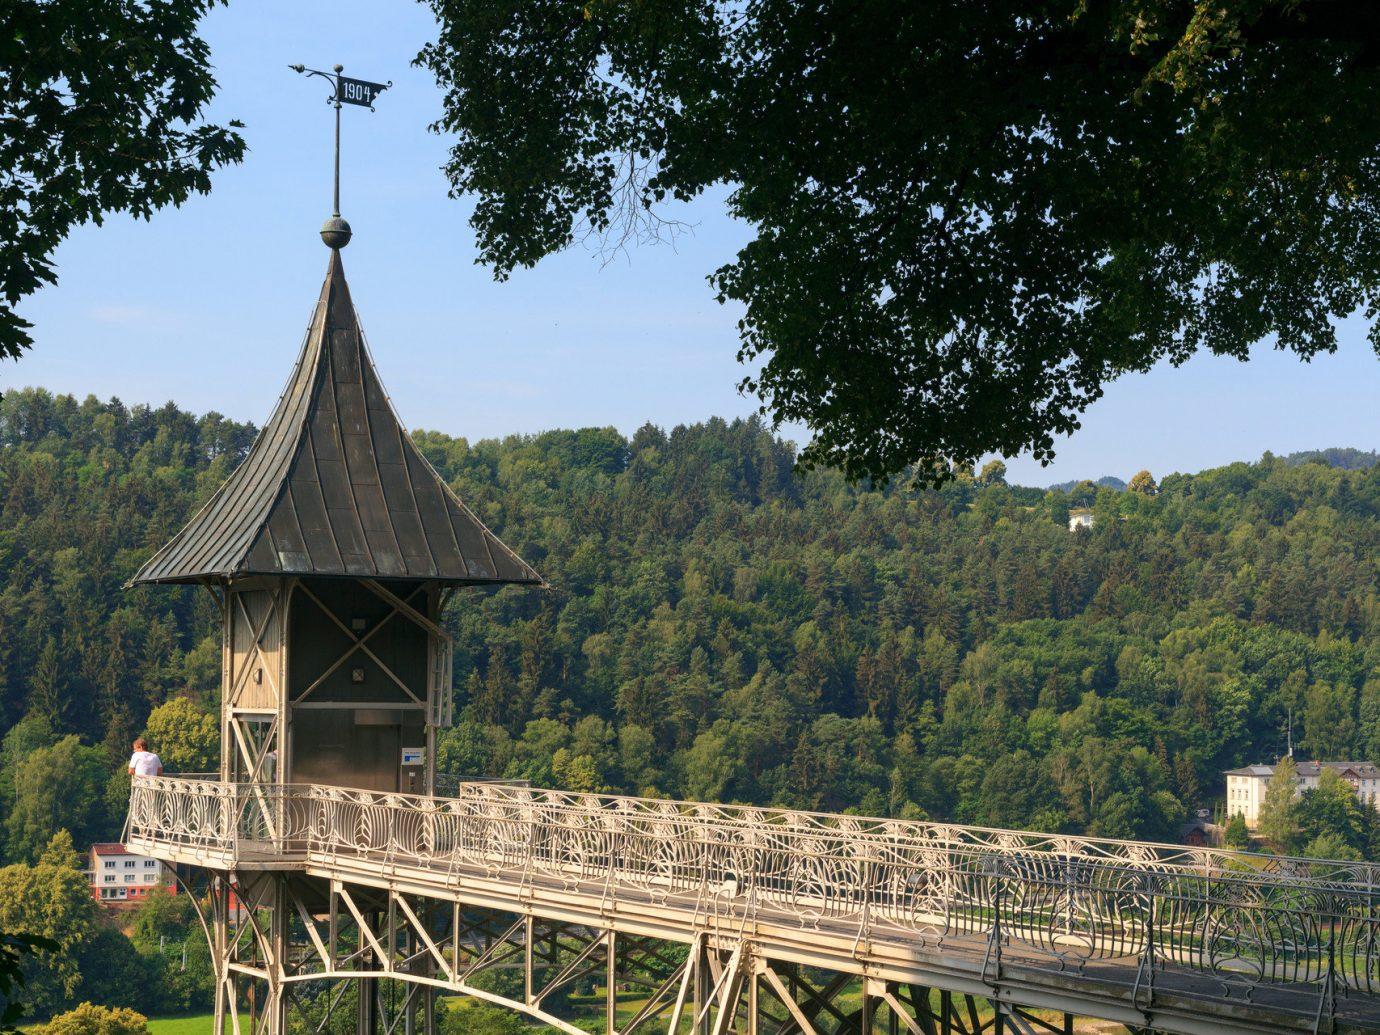 Trip Ideas tree outdoor building landmark bridge tourism rural area traveling park Forest surrounded